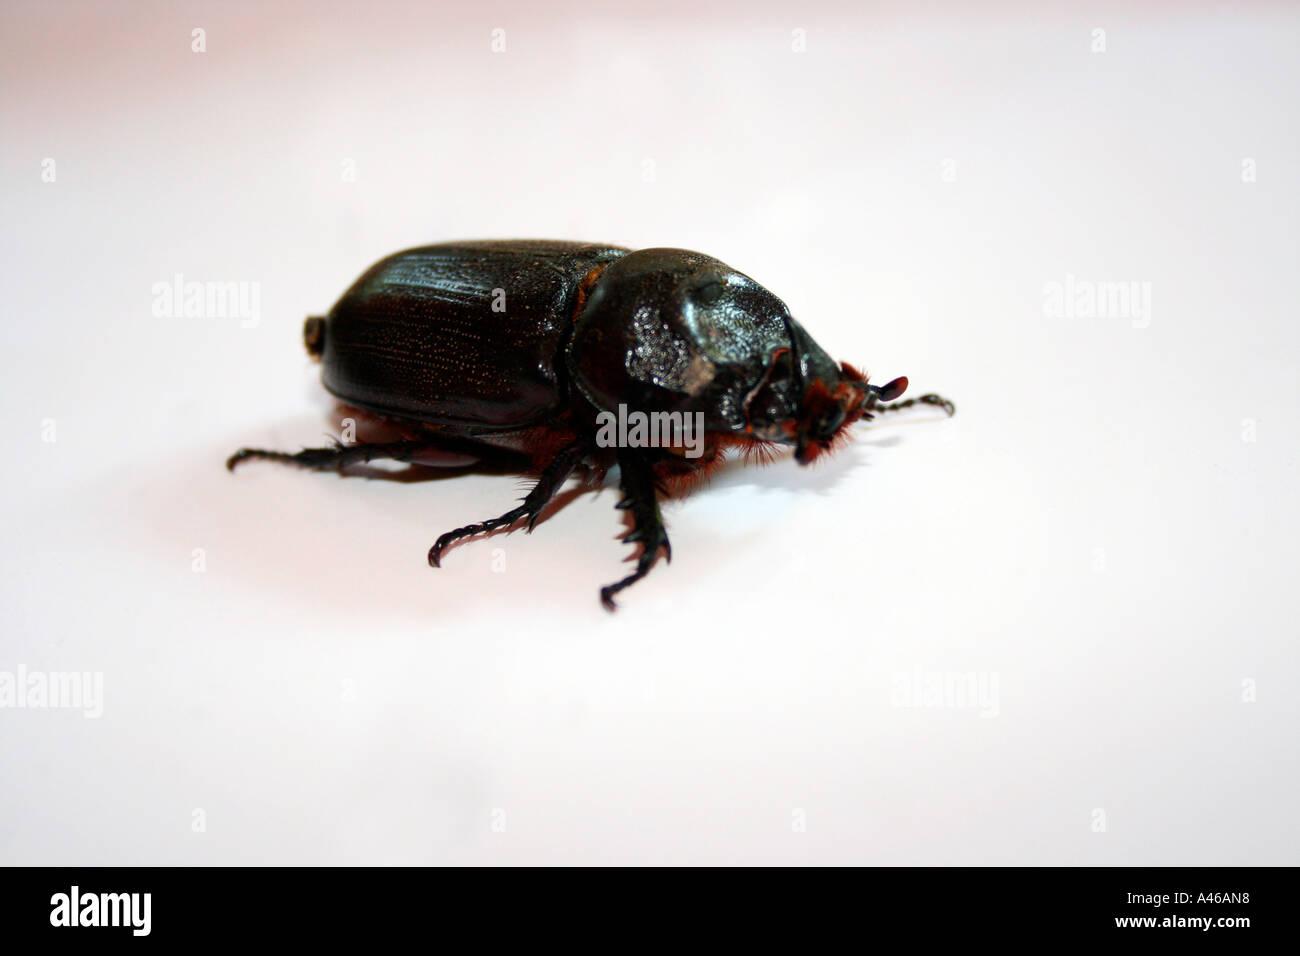 A black beetle. - Stock Image